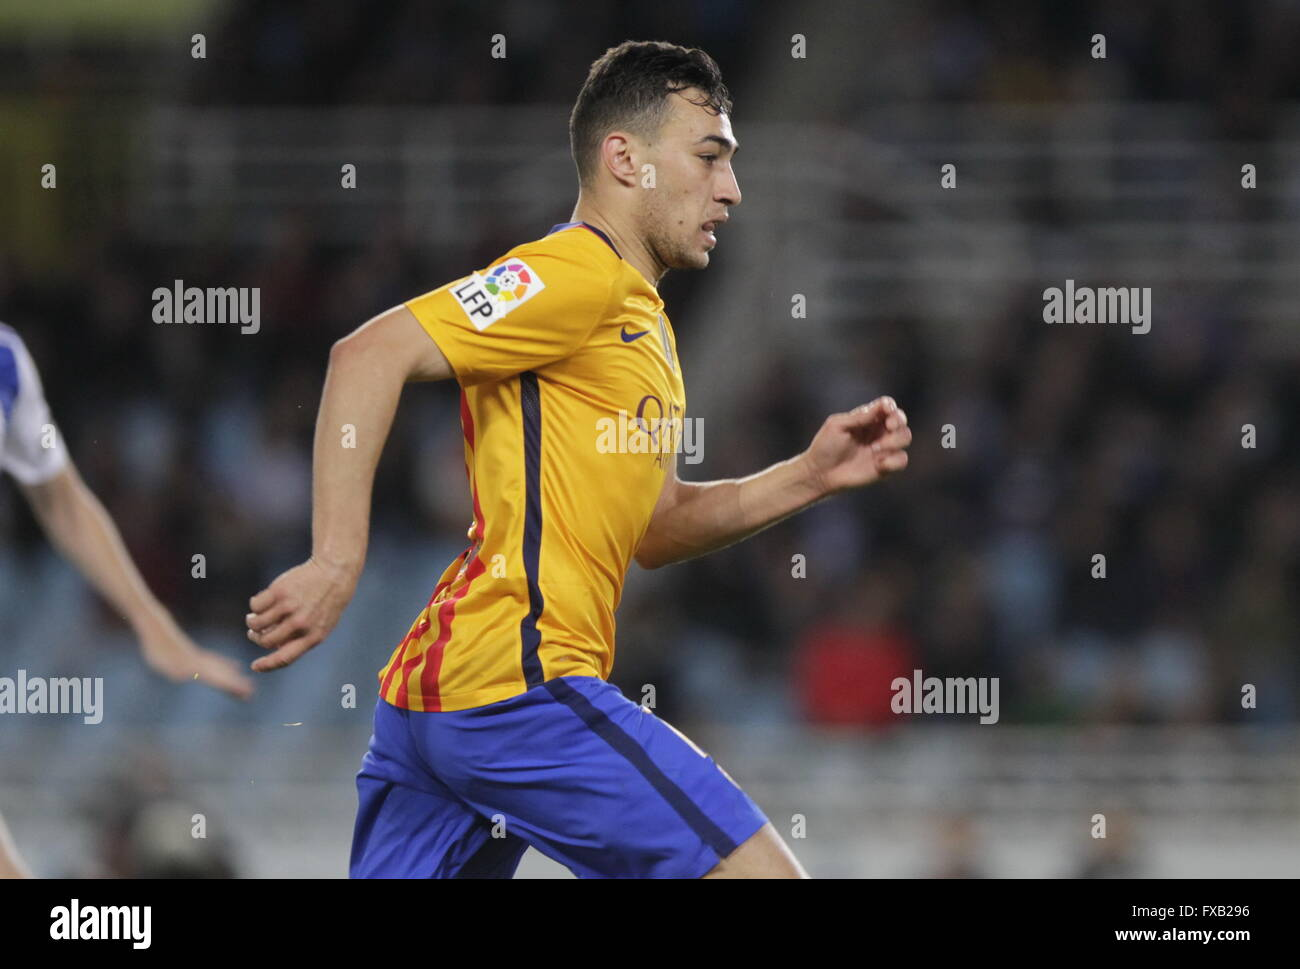 Munir   Barcelona in action during the La Liga match espagolde Real Sociedad - FC Barcelona at Anoeta Stadium - Stock Image